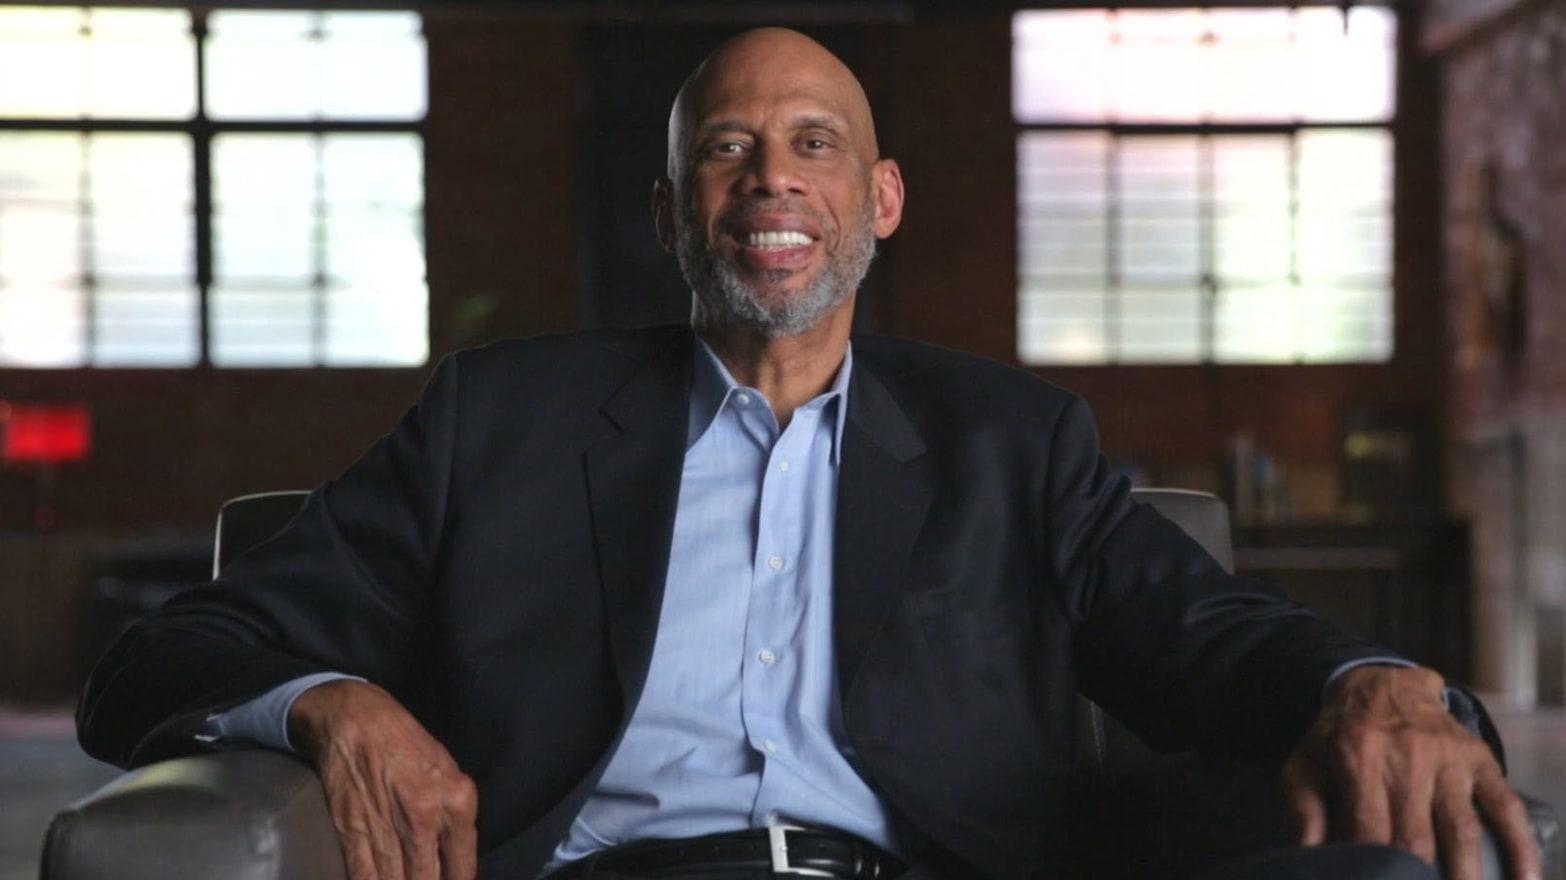 5414c24bf82 Kareem Abdul-Jabbar Finds His Voice: The NBA Legend on White Privilege,  Politics, and Islam